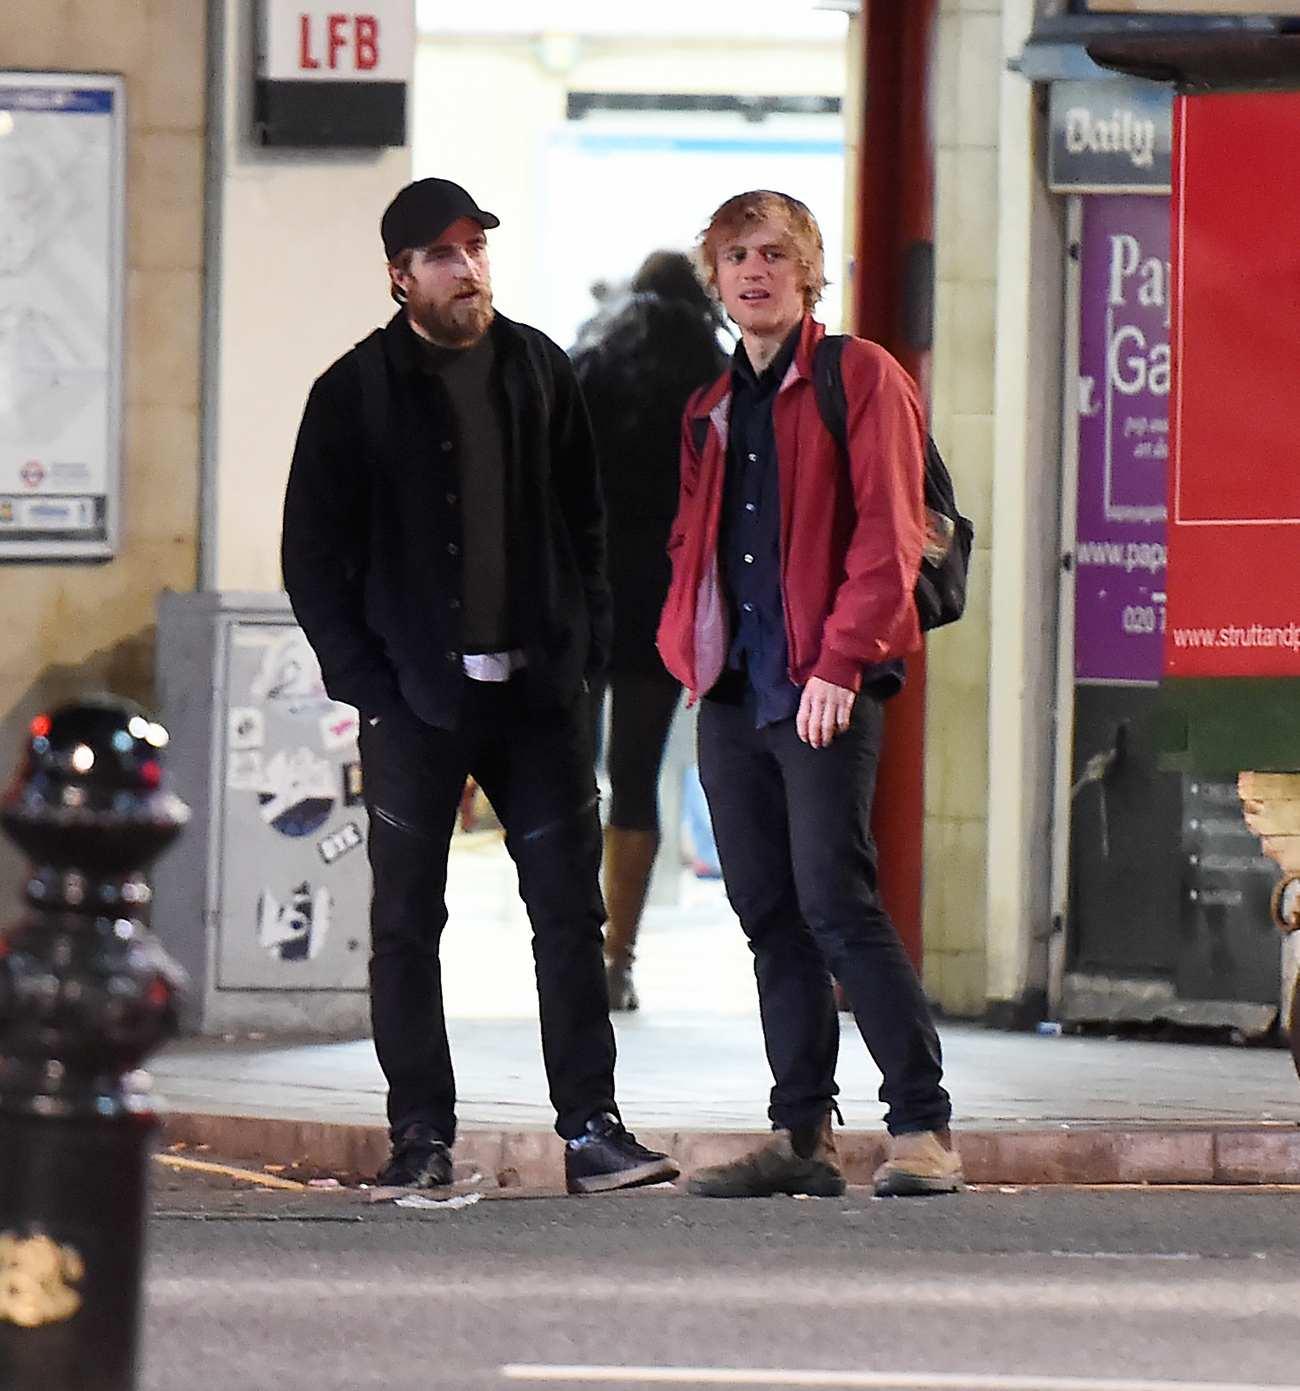 Robert Pattinson Leaving Underground Station With A Friend-1